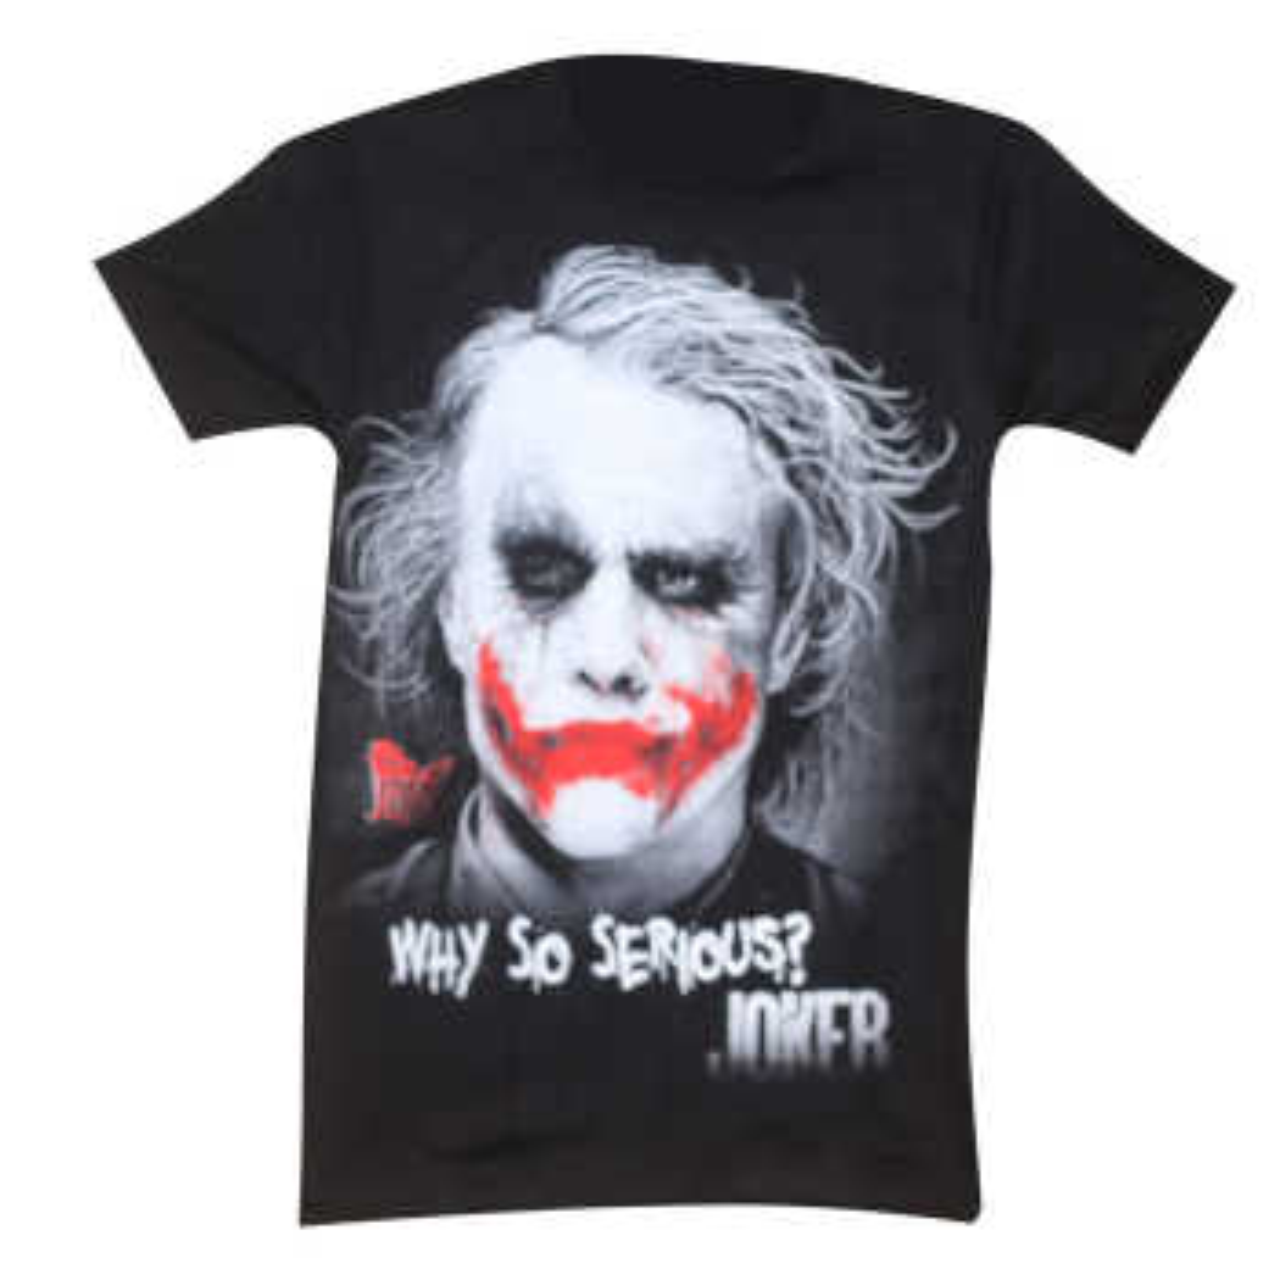 تی شرت پسرانه طرح هیث لجر کد 38